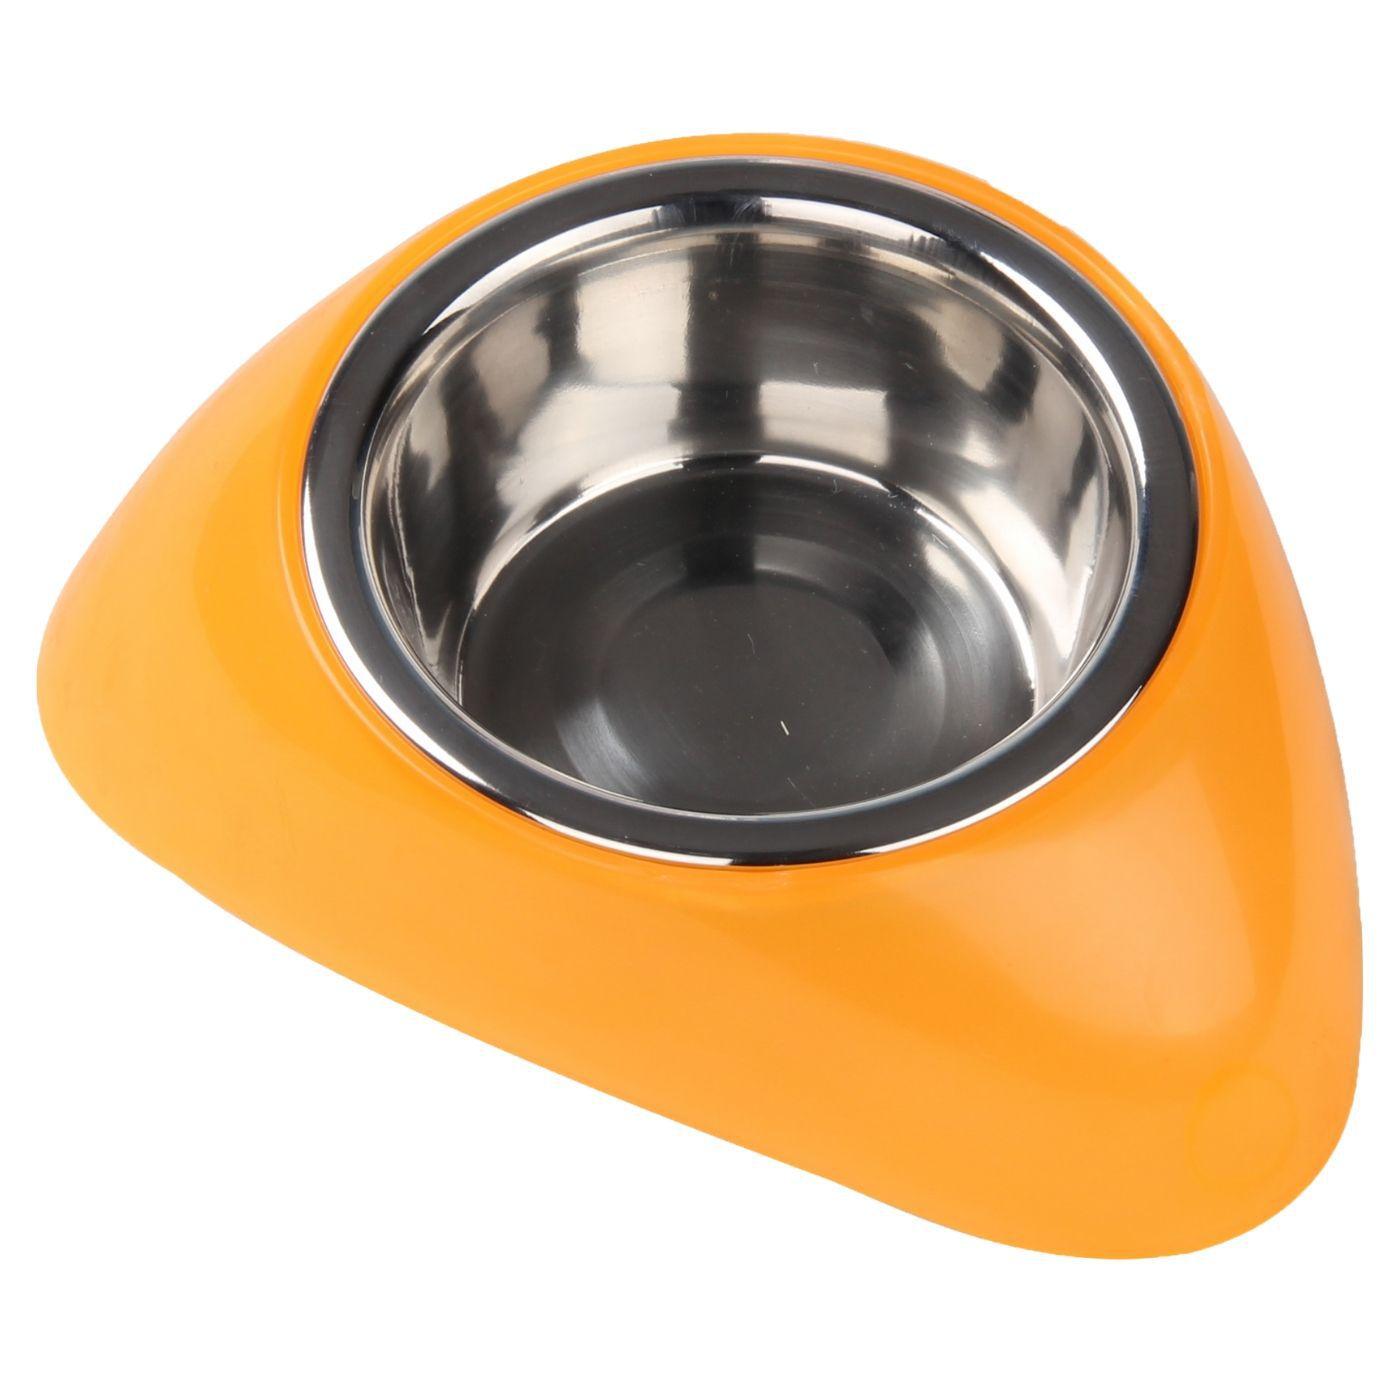 Prato de INOX para Cachorro 350ml Pawise